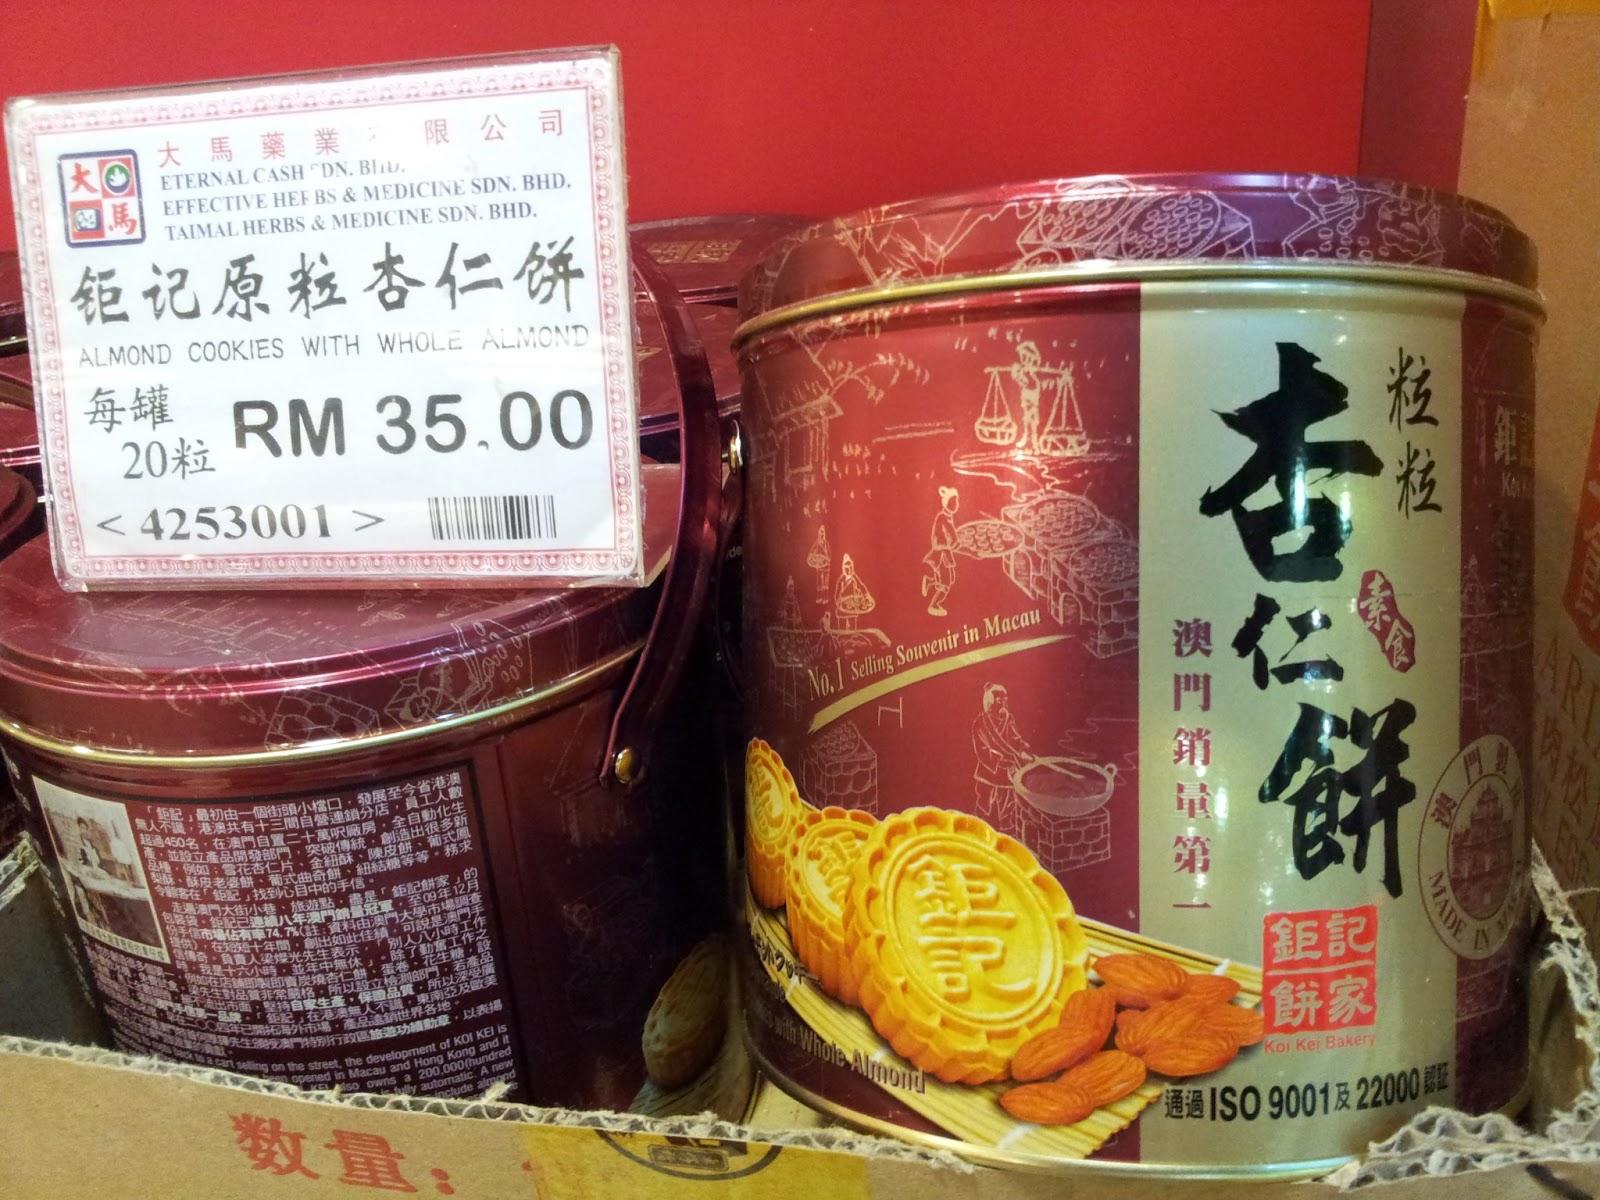 Almond Cookies Macau Famous Almond Cookies From